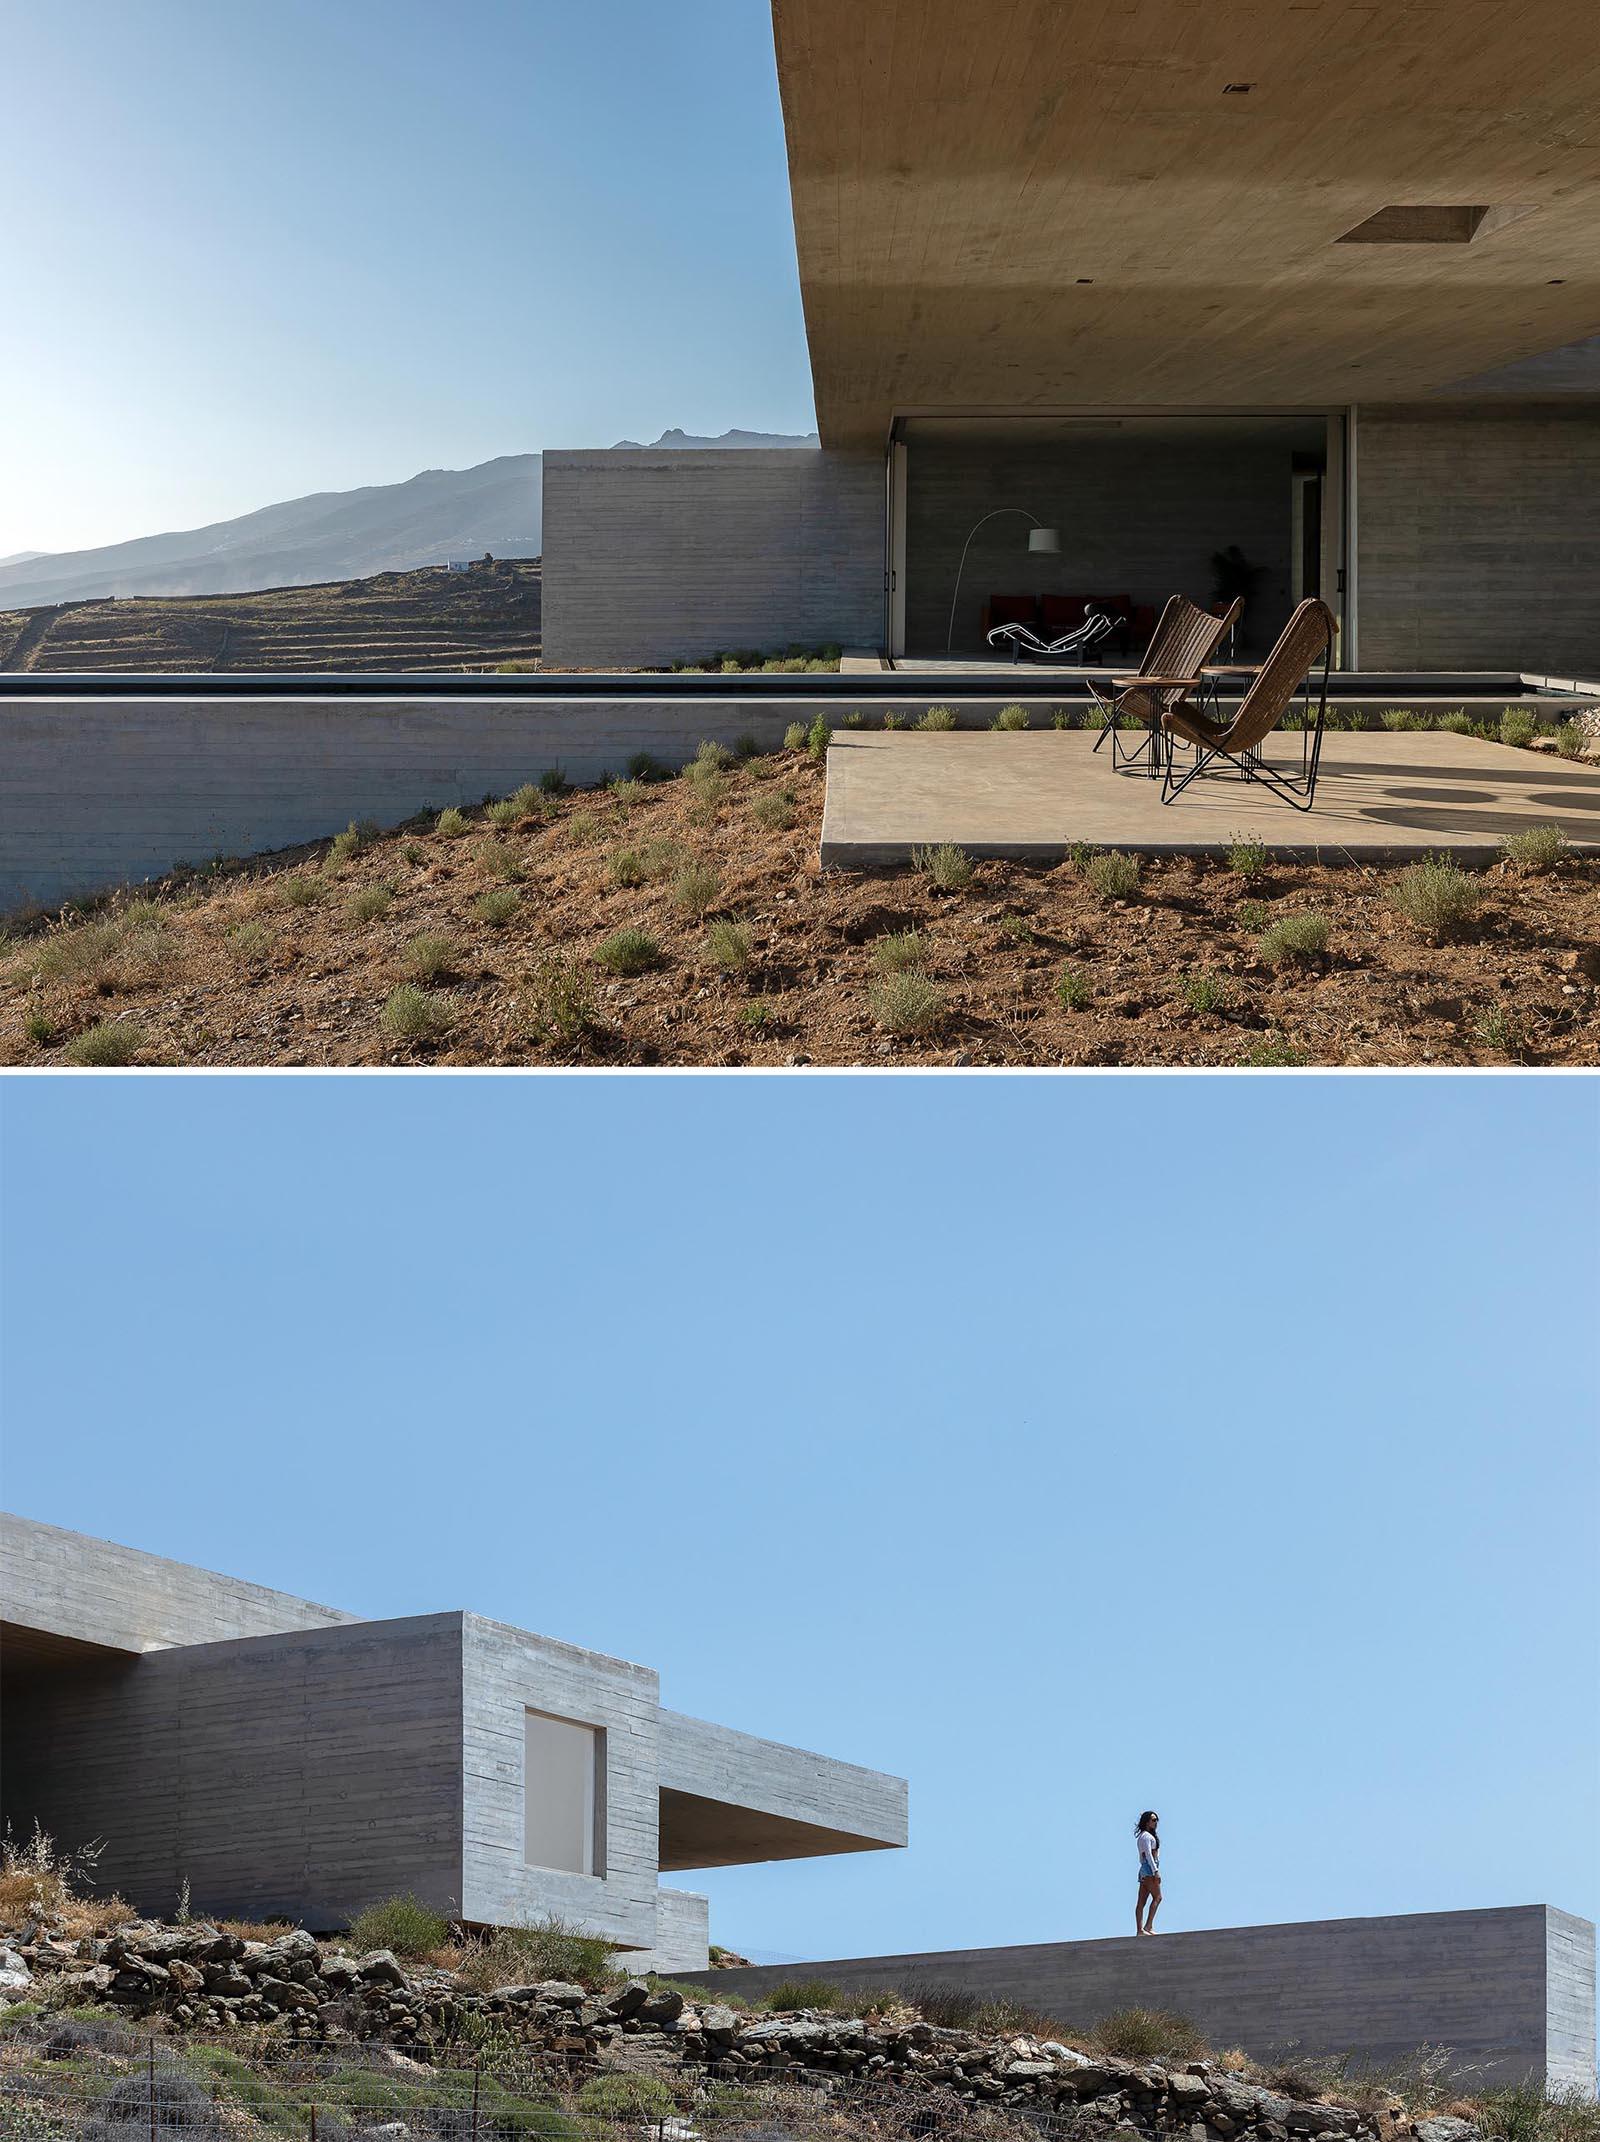 A modern concrete house built into a hillside.